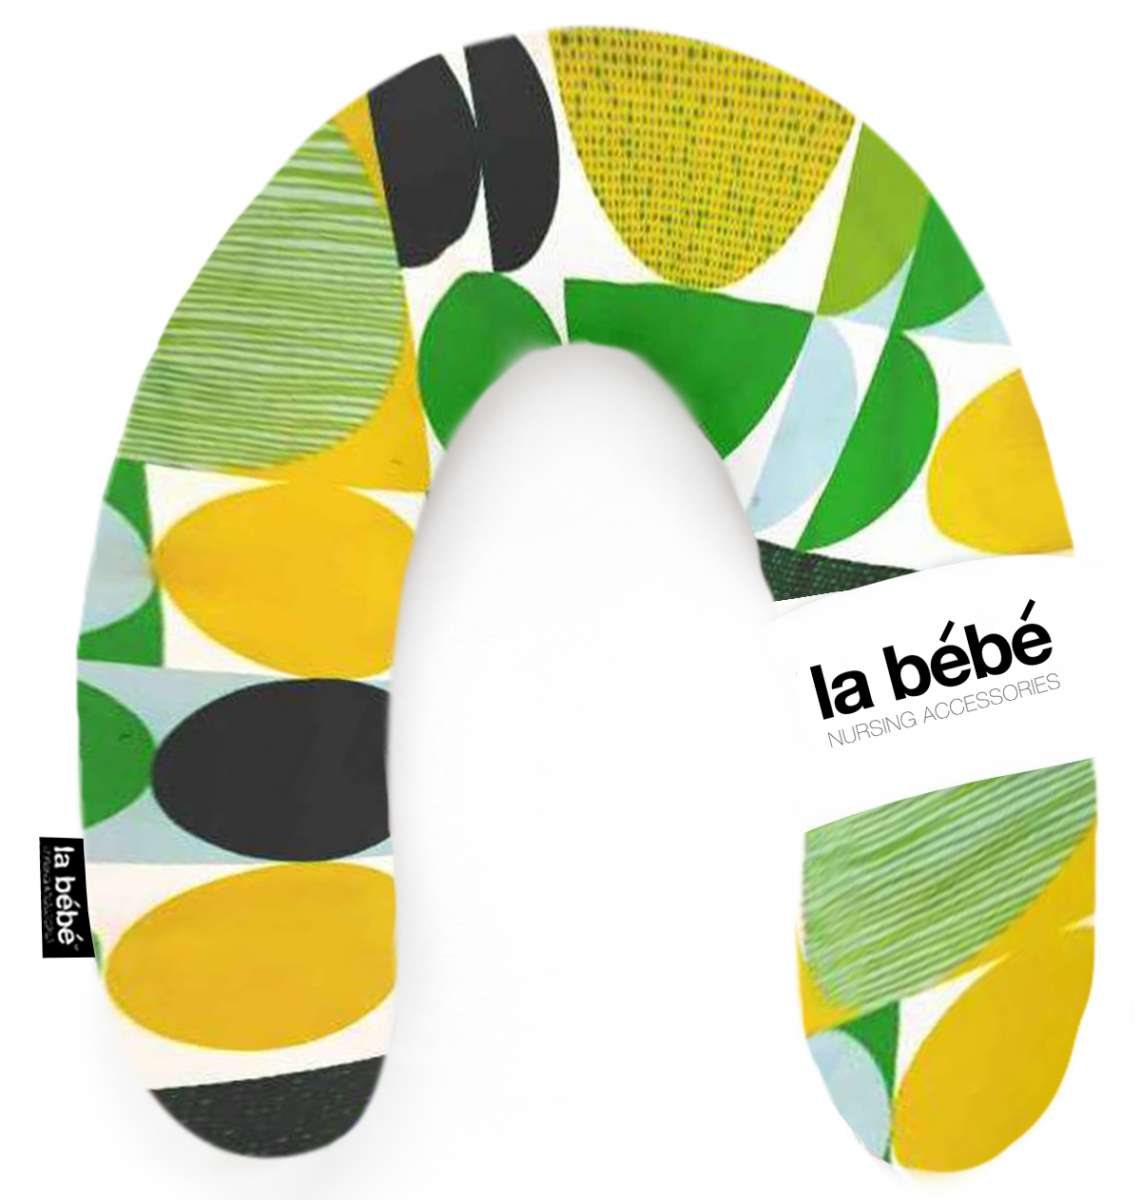 La Bebe Rich Cotton Nursing Maternity Pillow Green yellow circles Pakaviņš pakavs mazuļa barošanai, gulēšanai